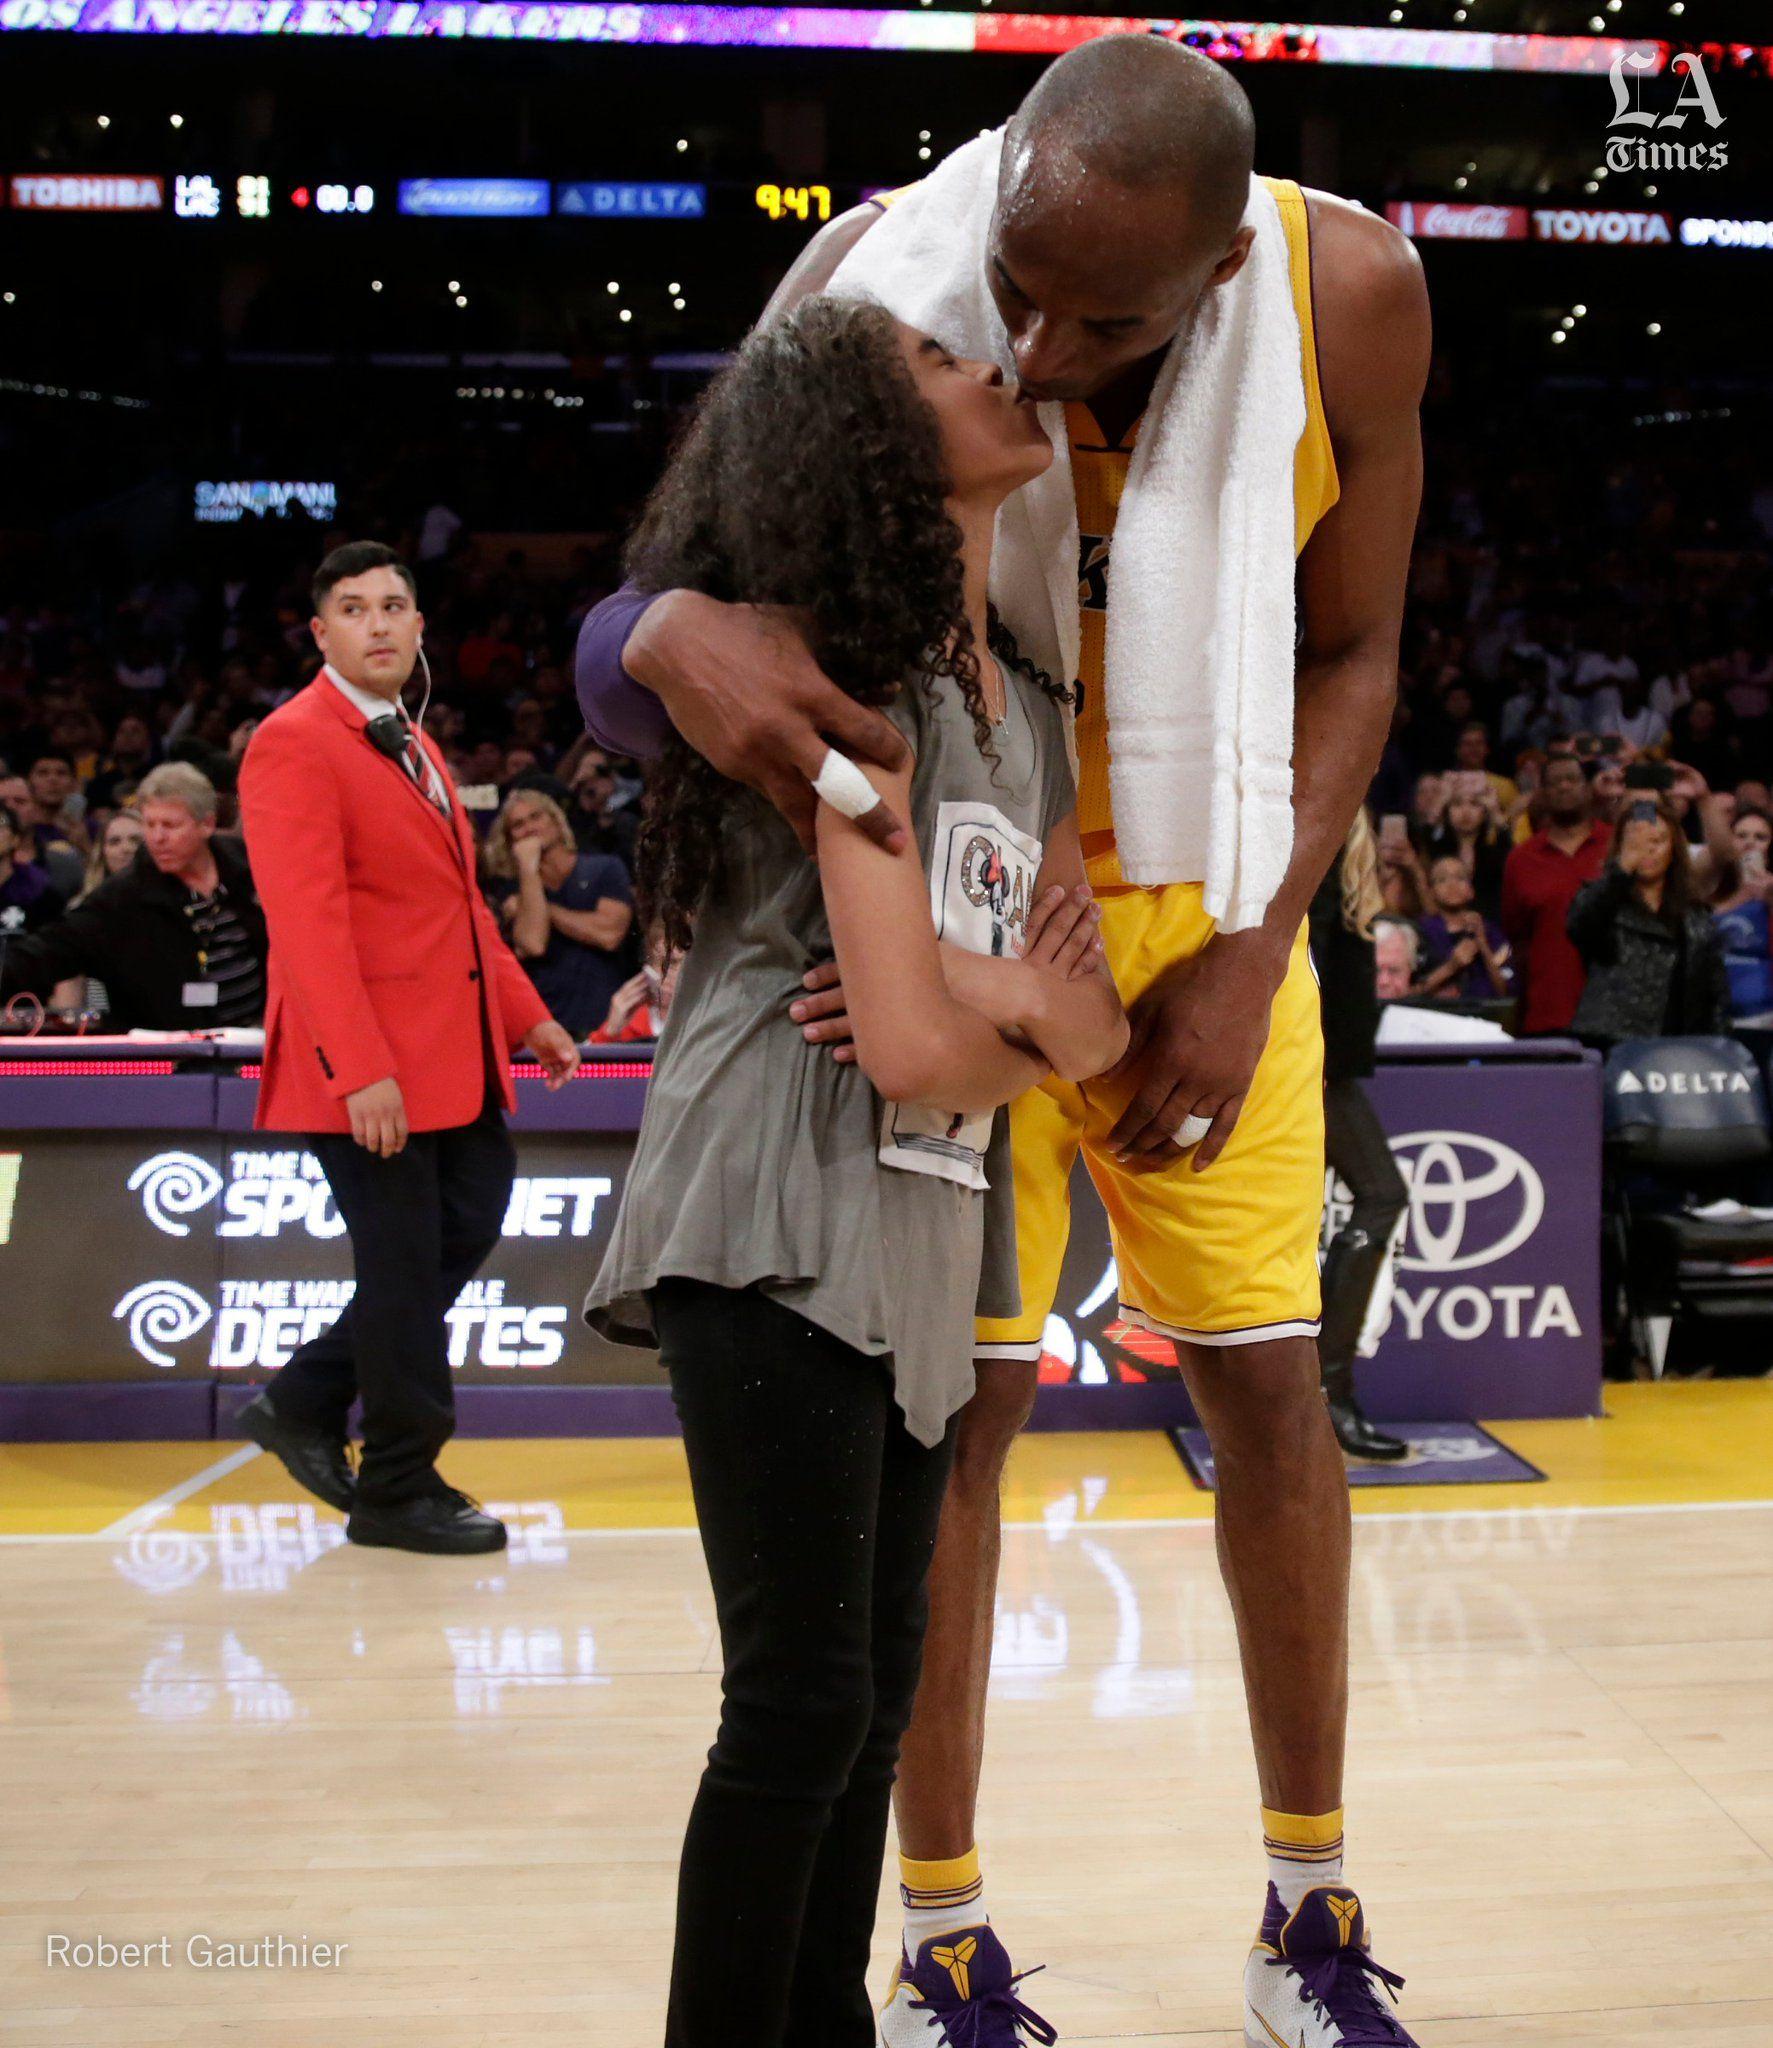 Los Angeles Times On Twitter In 2020 Kobe Bryant Black Mamba Kobe Bryant Daughters Kobe Bryant 24